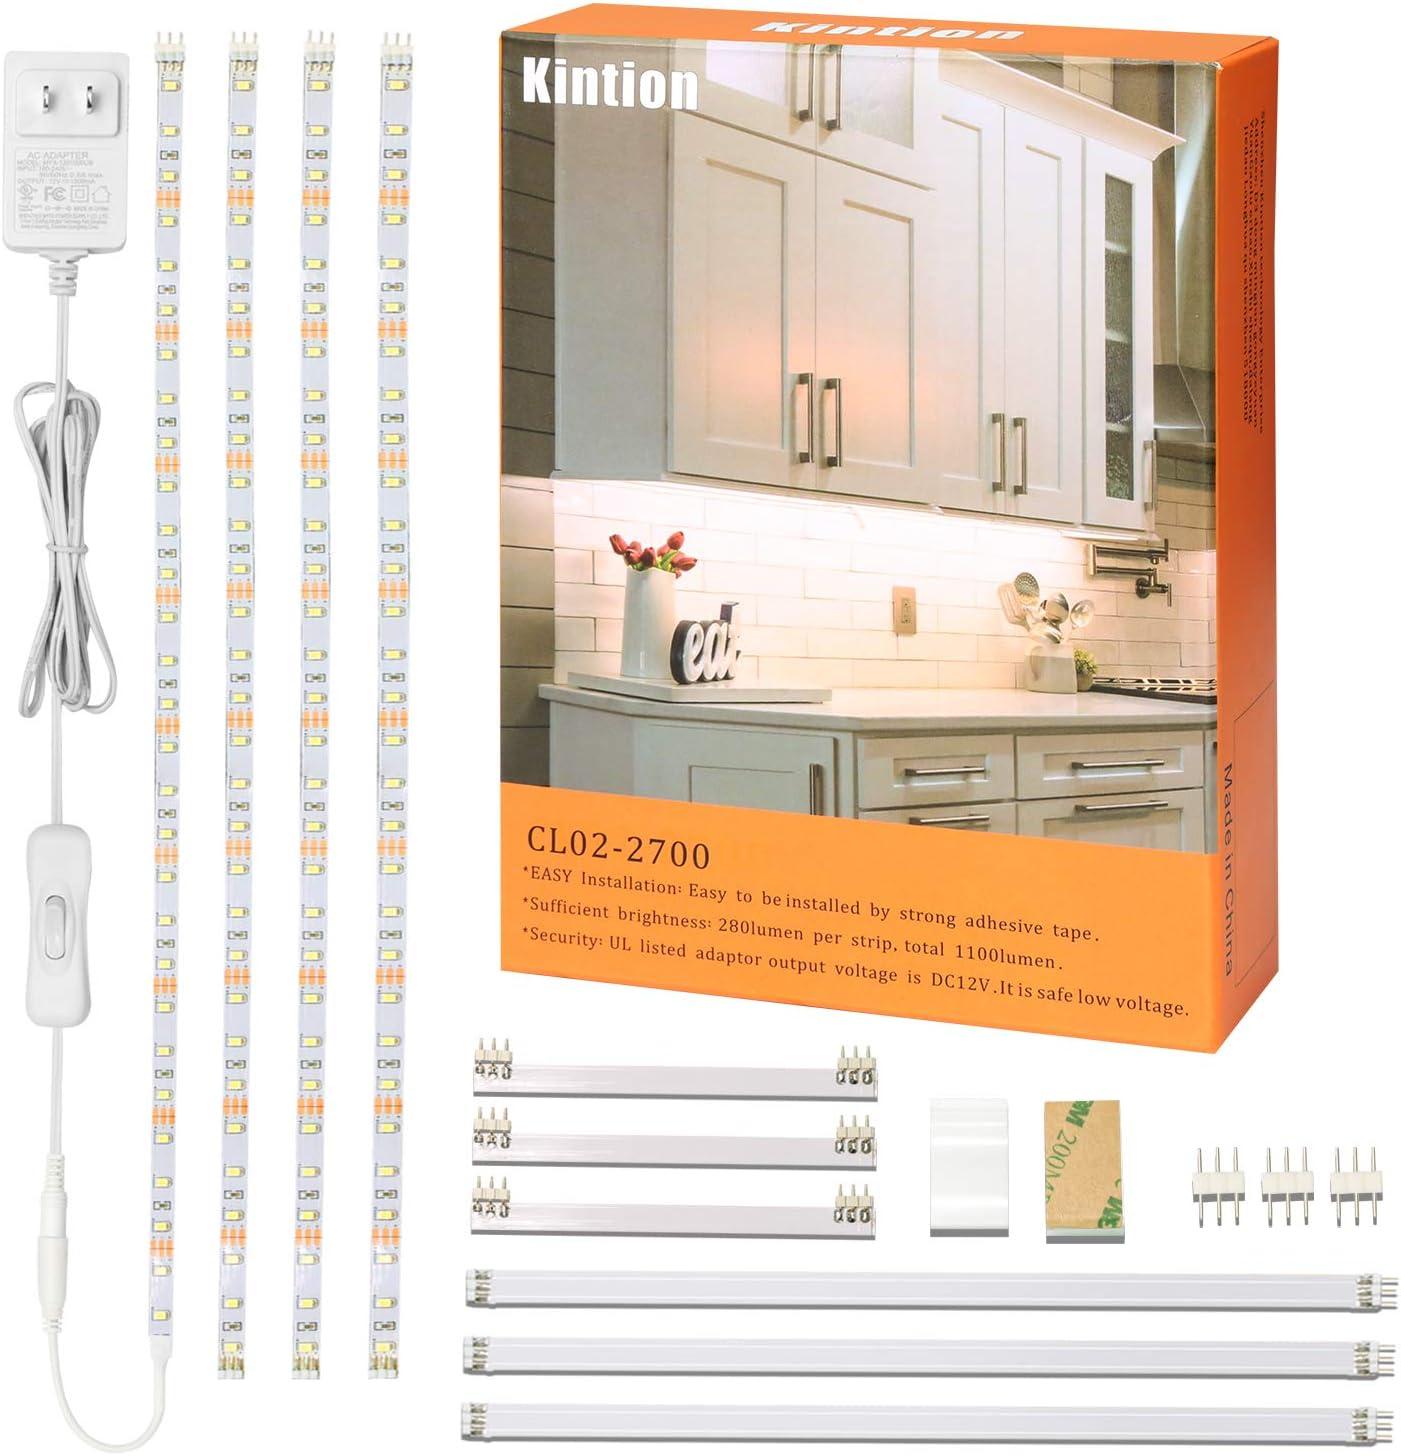 kintion led under cabinet lighting under counter lights flexible led tape lights for kitchen shelf showcase cupboard warm white led strip